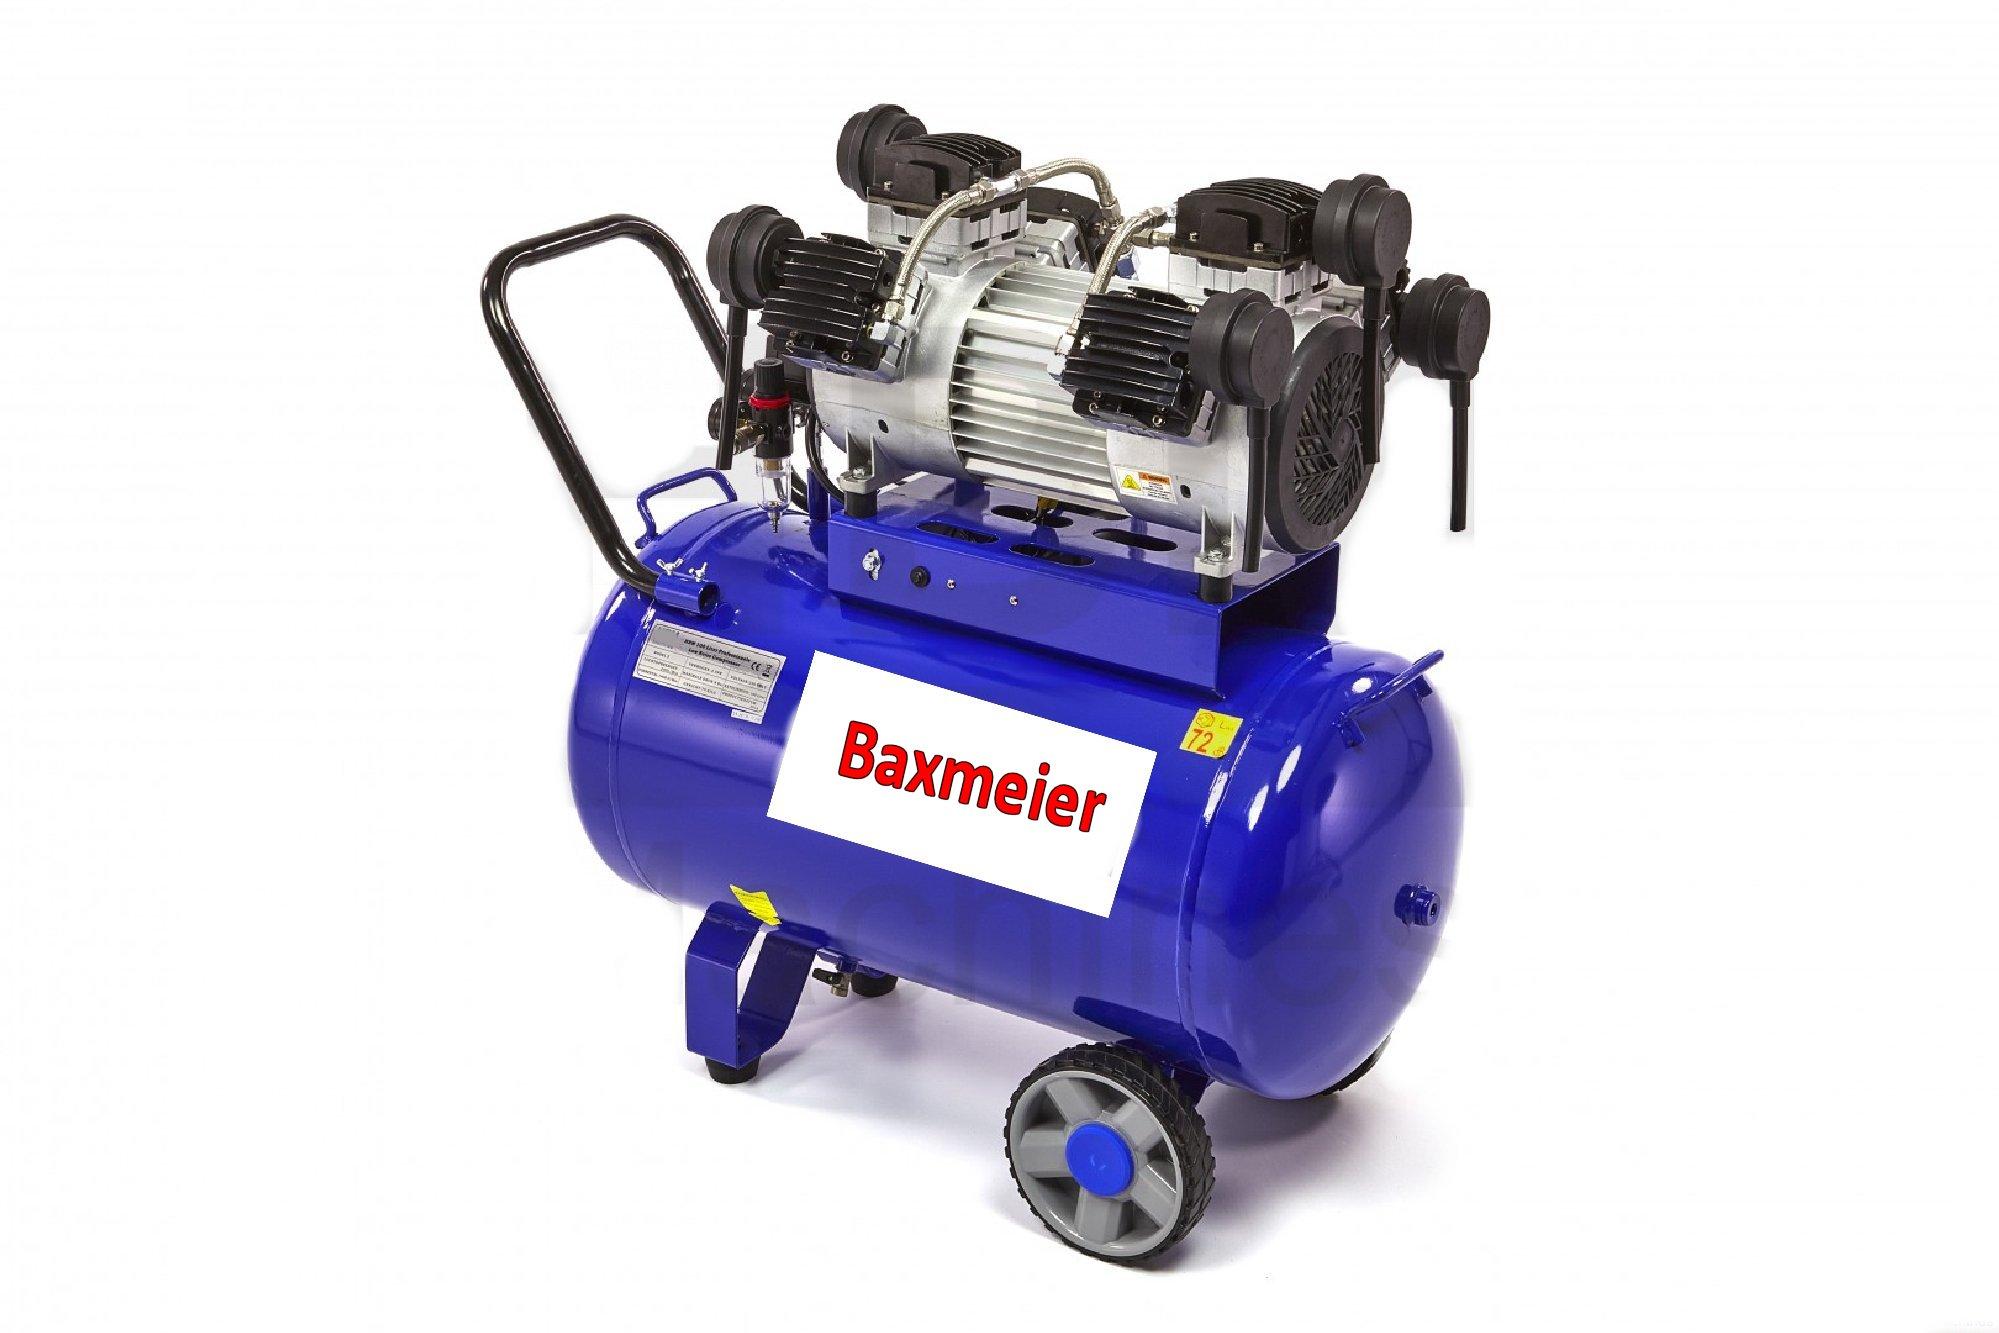 Aeg Kühlschrank Hotline : Leiser kompressor leiseläufer ca.70 db 100 l kessel super leise low